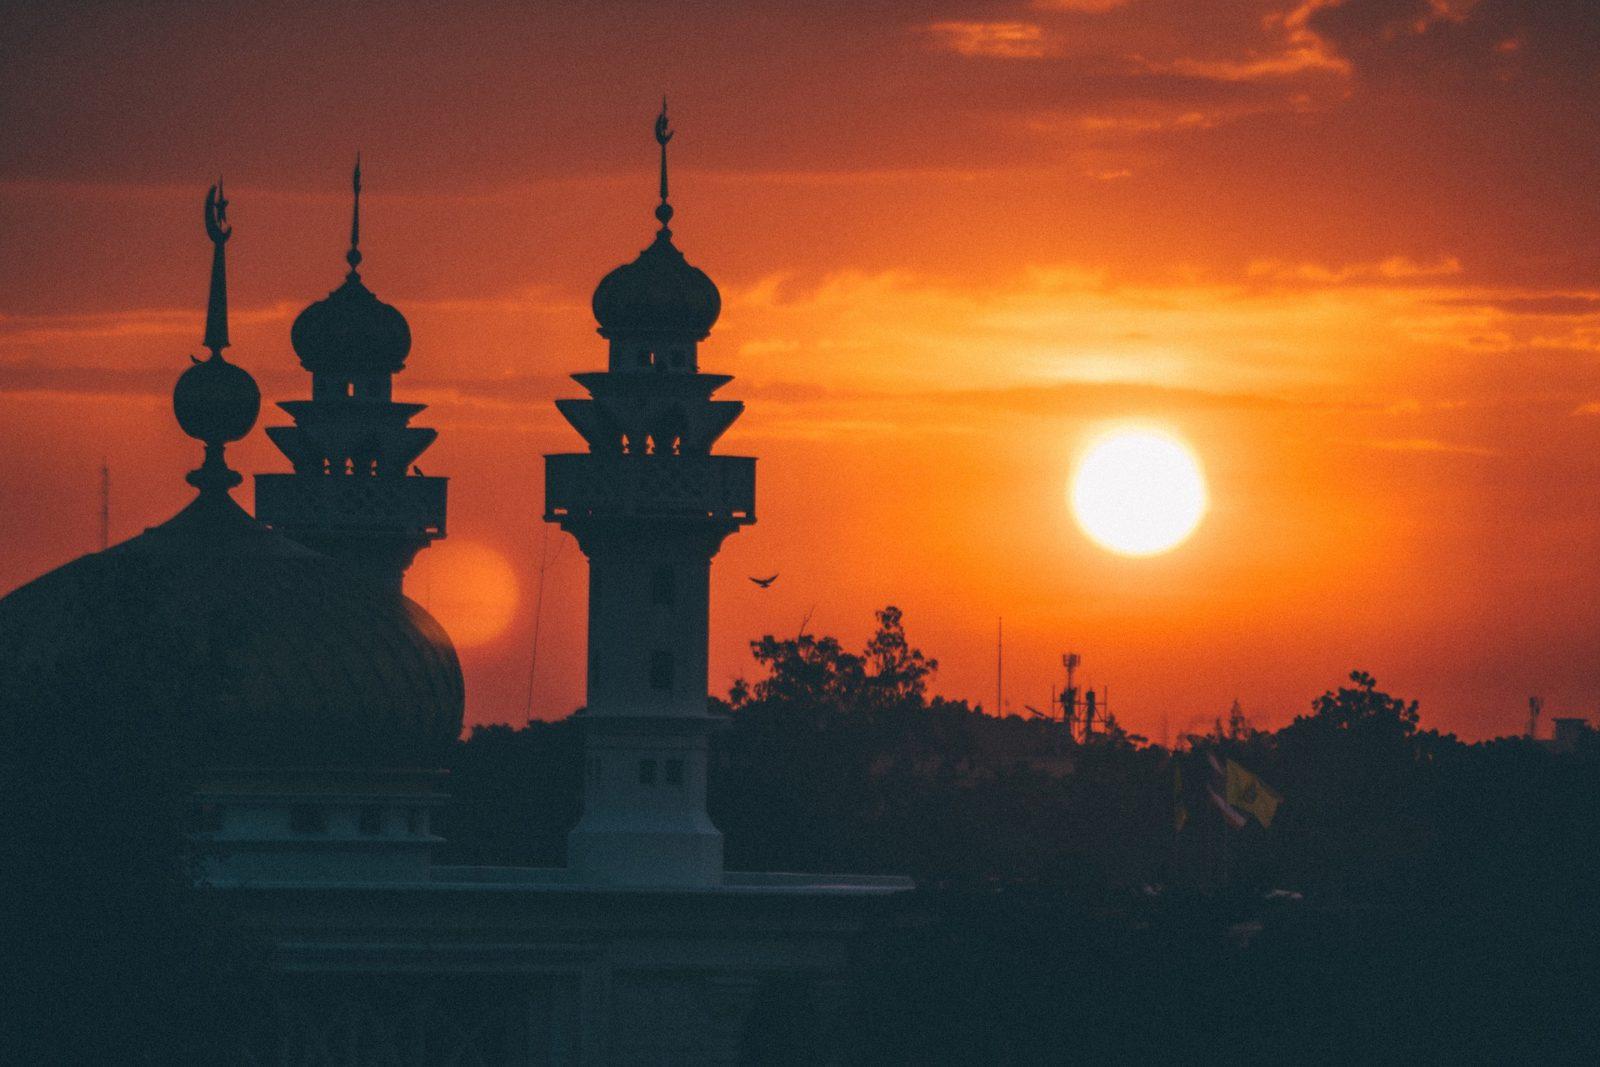 mosque-1603765_1920